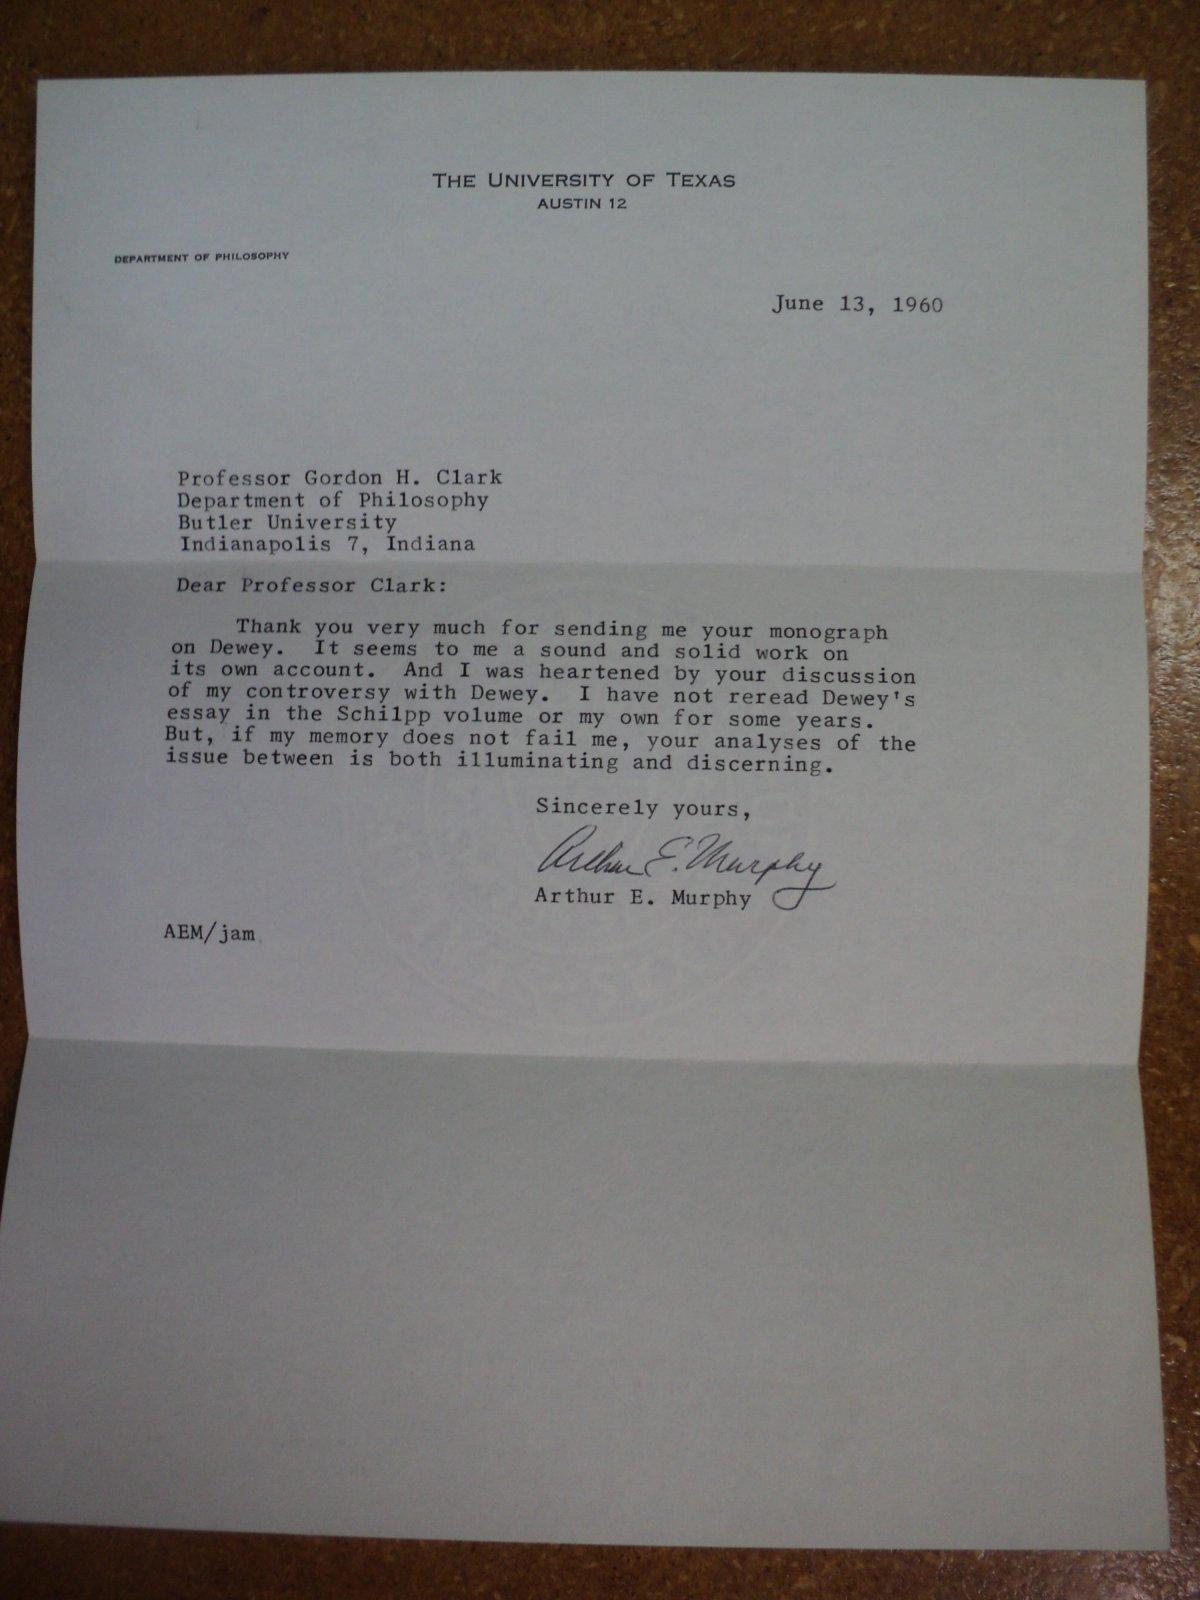 GHC Review 10; Dewey - Arthur E. Murphy 1960